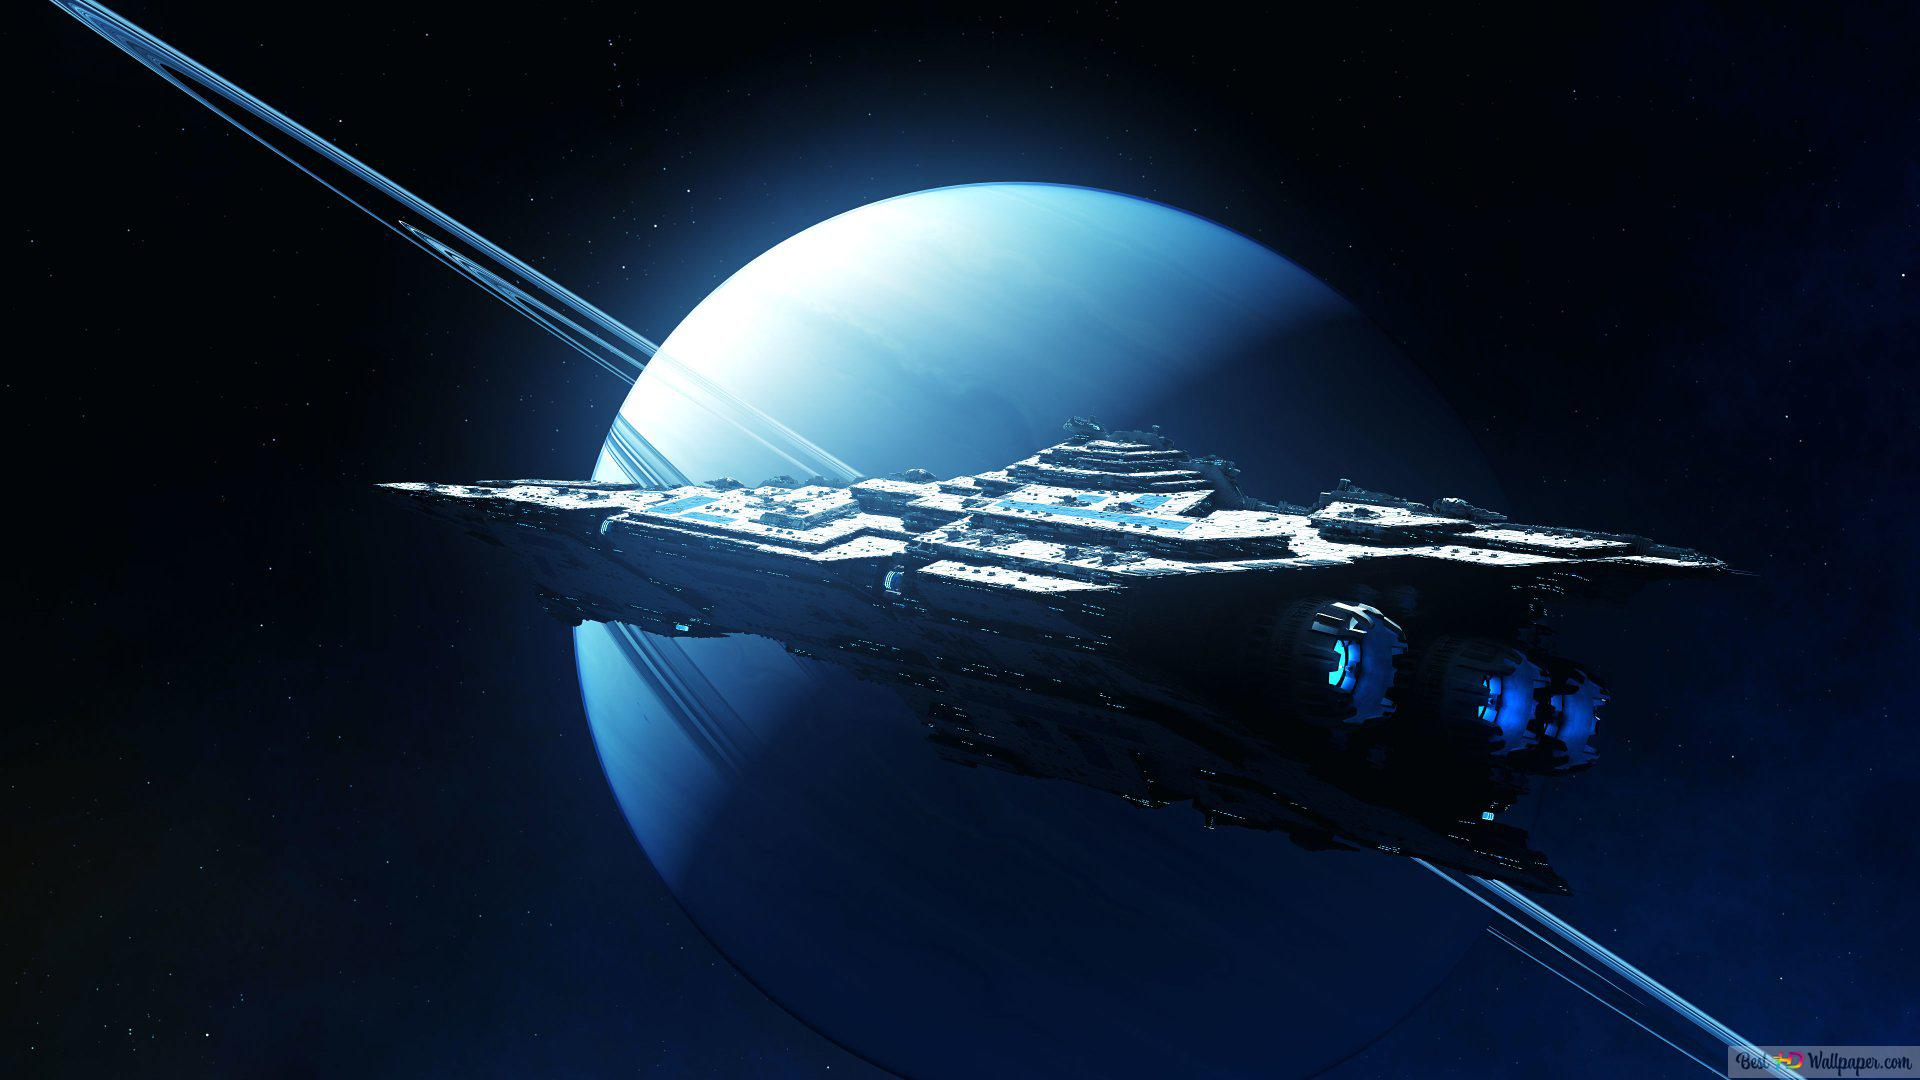 Spaceship Near Saturn Hd Wallpaper Download